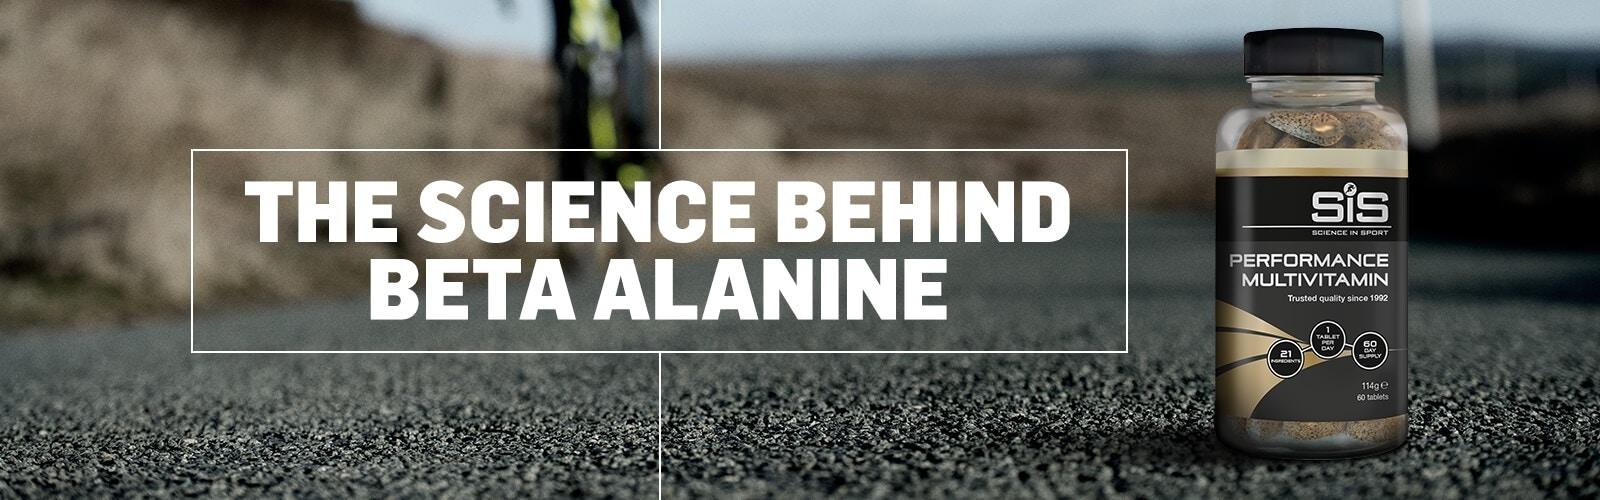 SIS - The science behind Beta Alanine